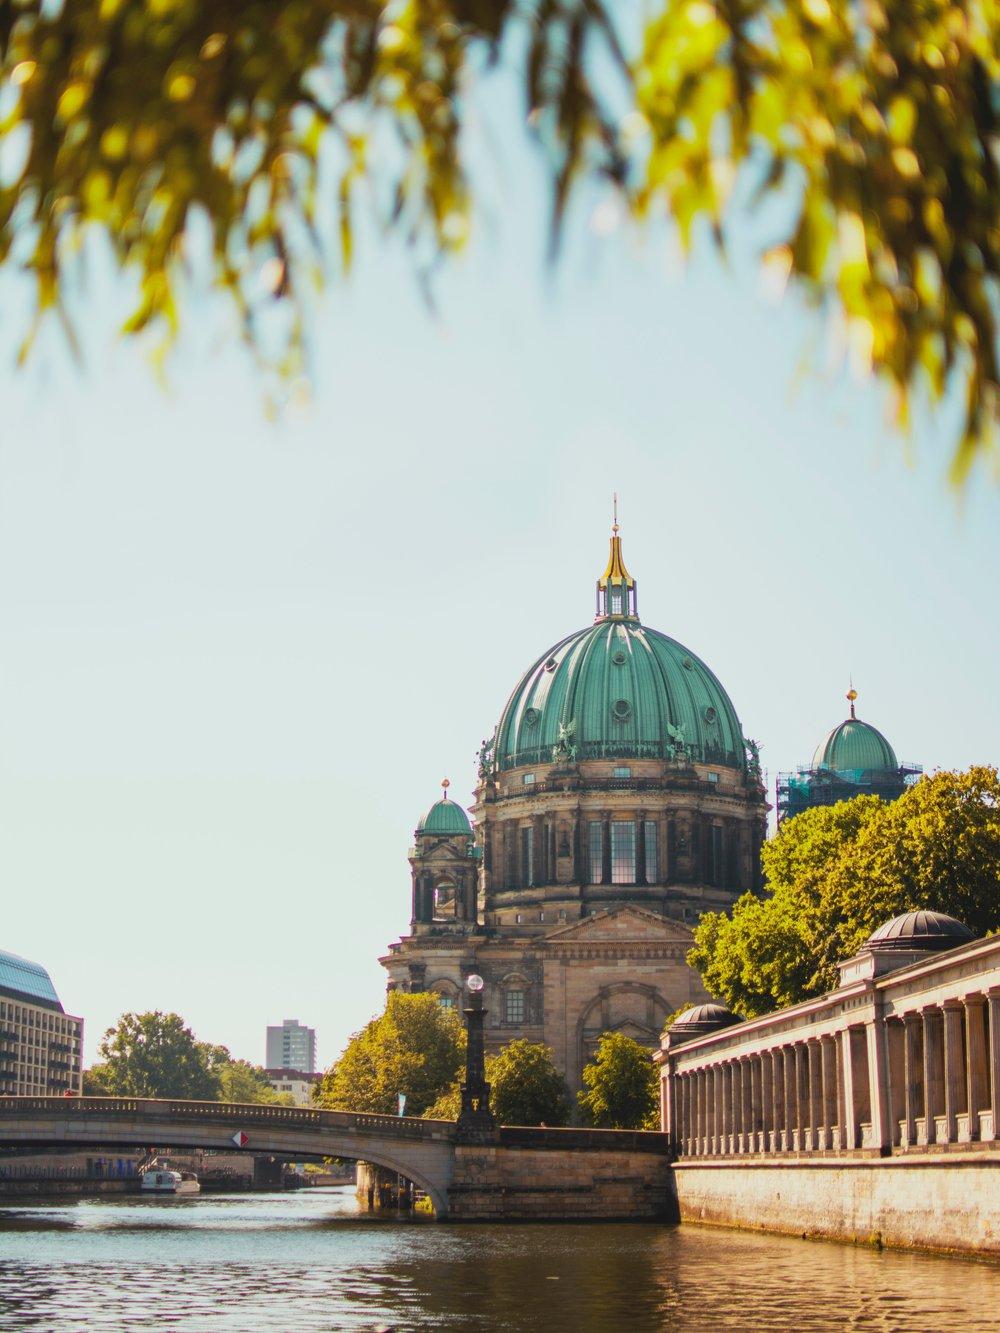 Artistic Walking Tour of Berlin